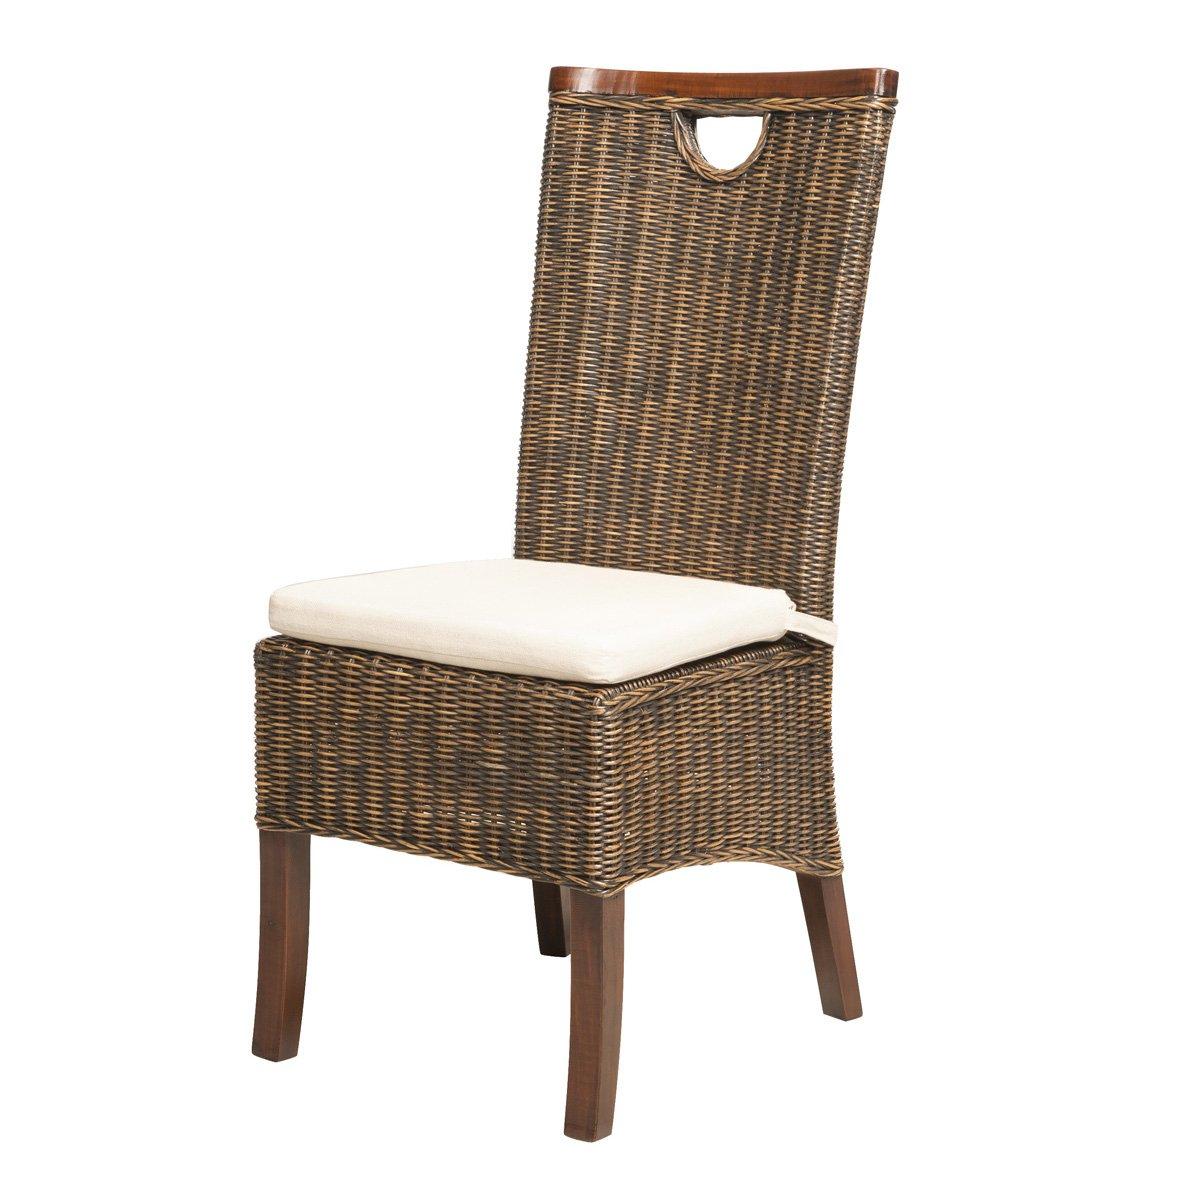 SOLDES : -61% Chaise en rotin tressé RACINE moka - Rotin Design